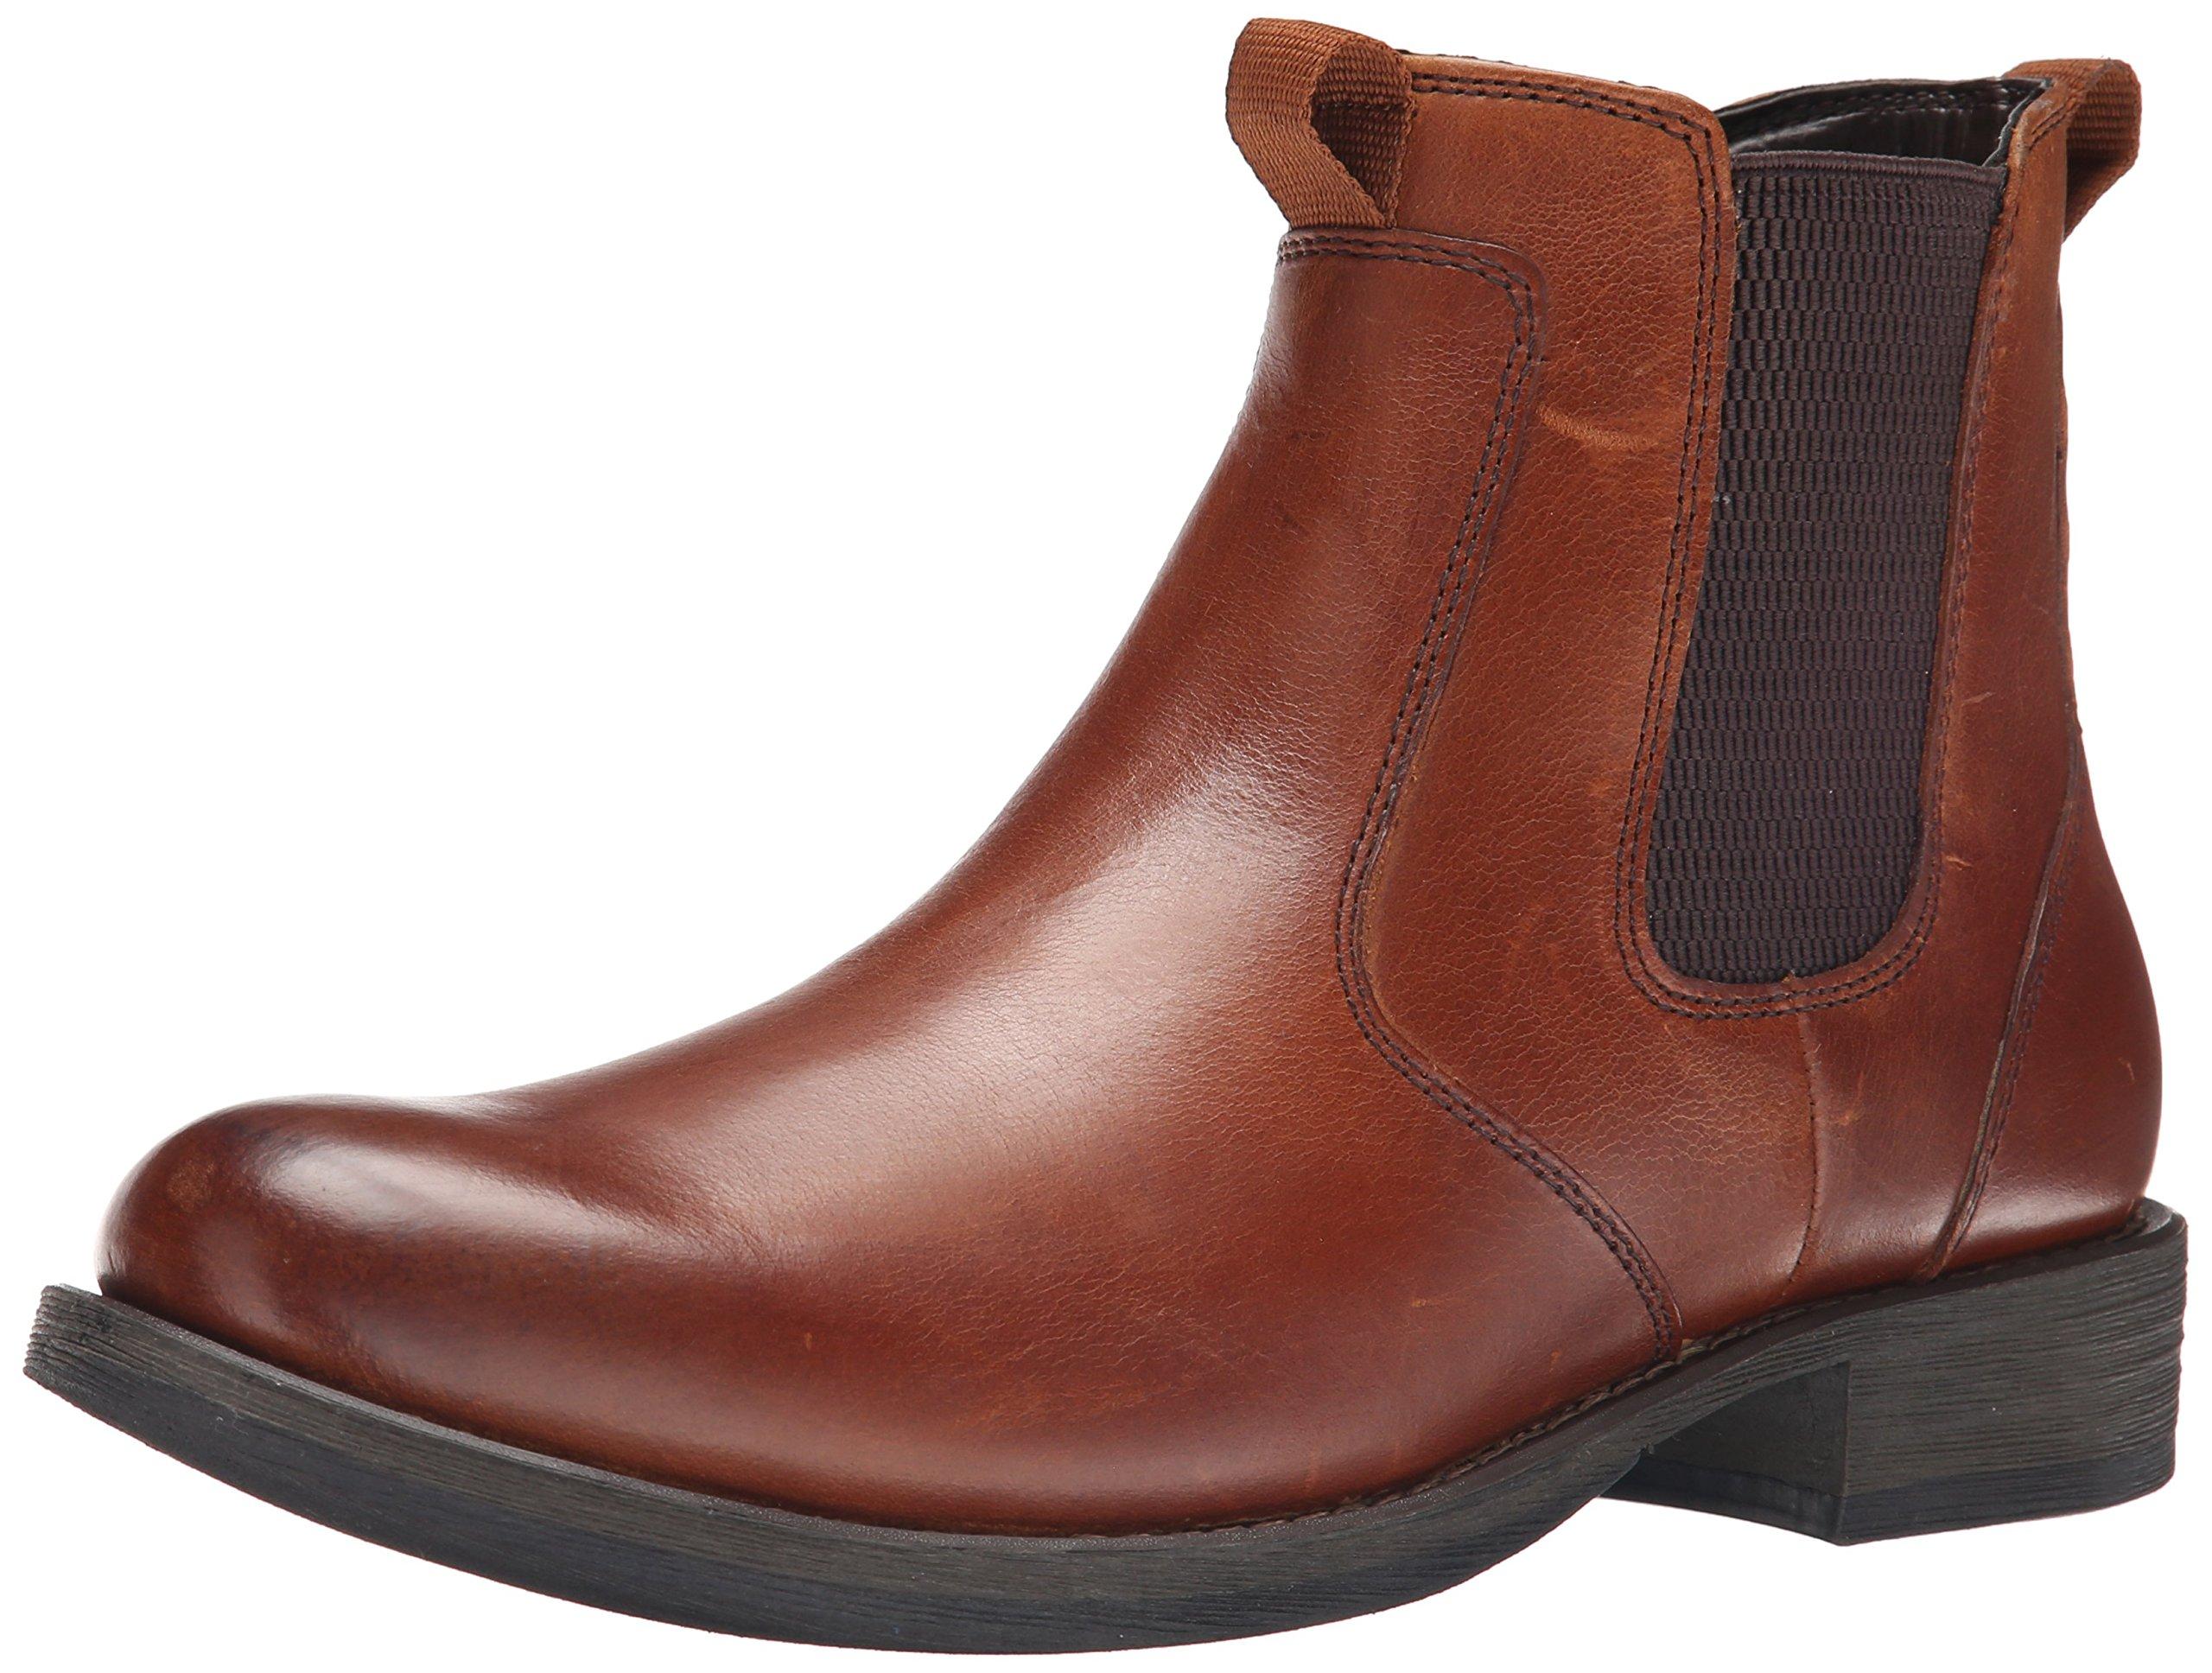 Eastland Men's Daily Double Chelsea Boot, Tan, 12 D US